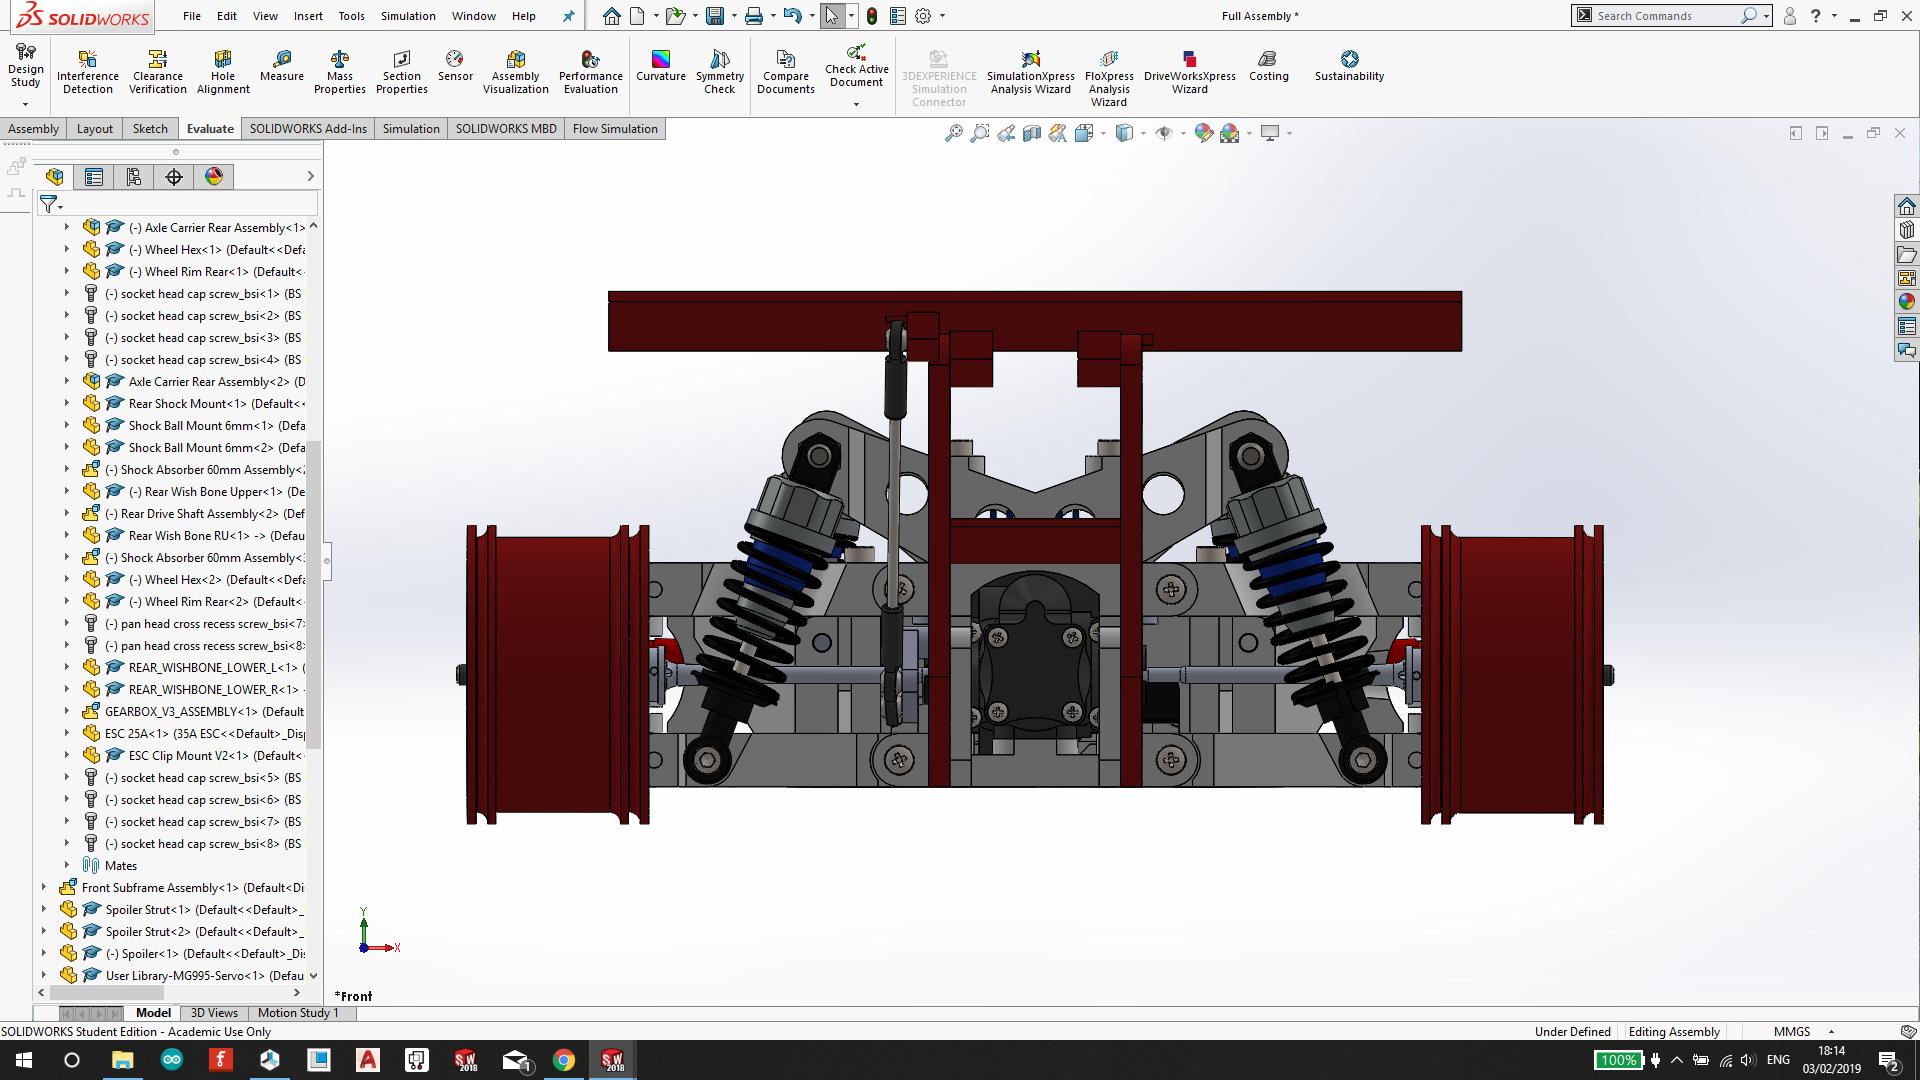 Wltoys A959 RC遥控车模型3D图纸 Solidworks2018 附STEP